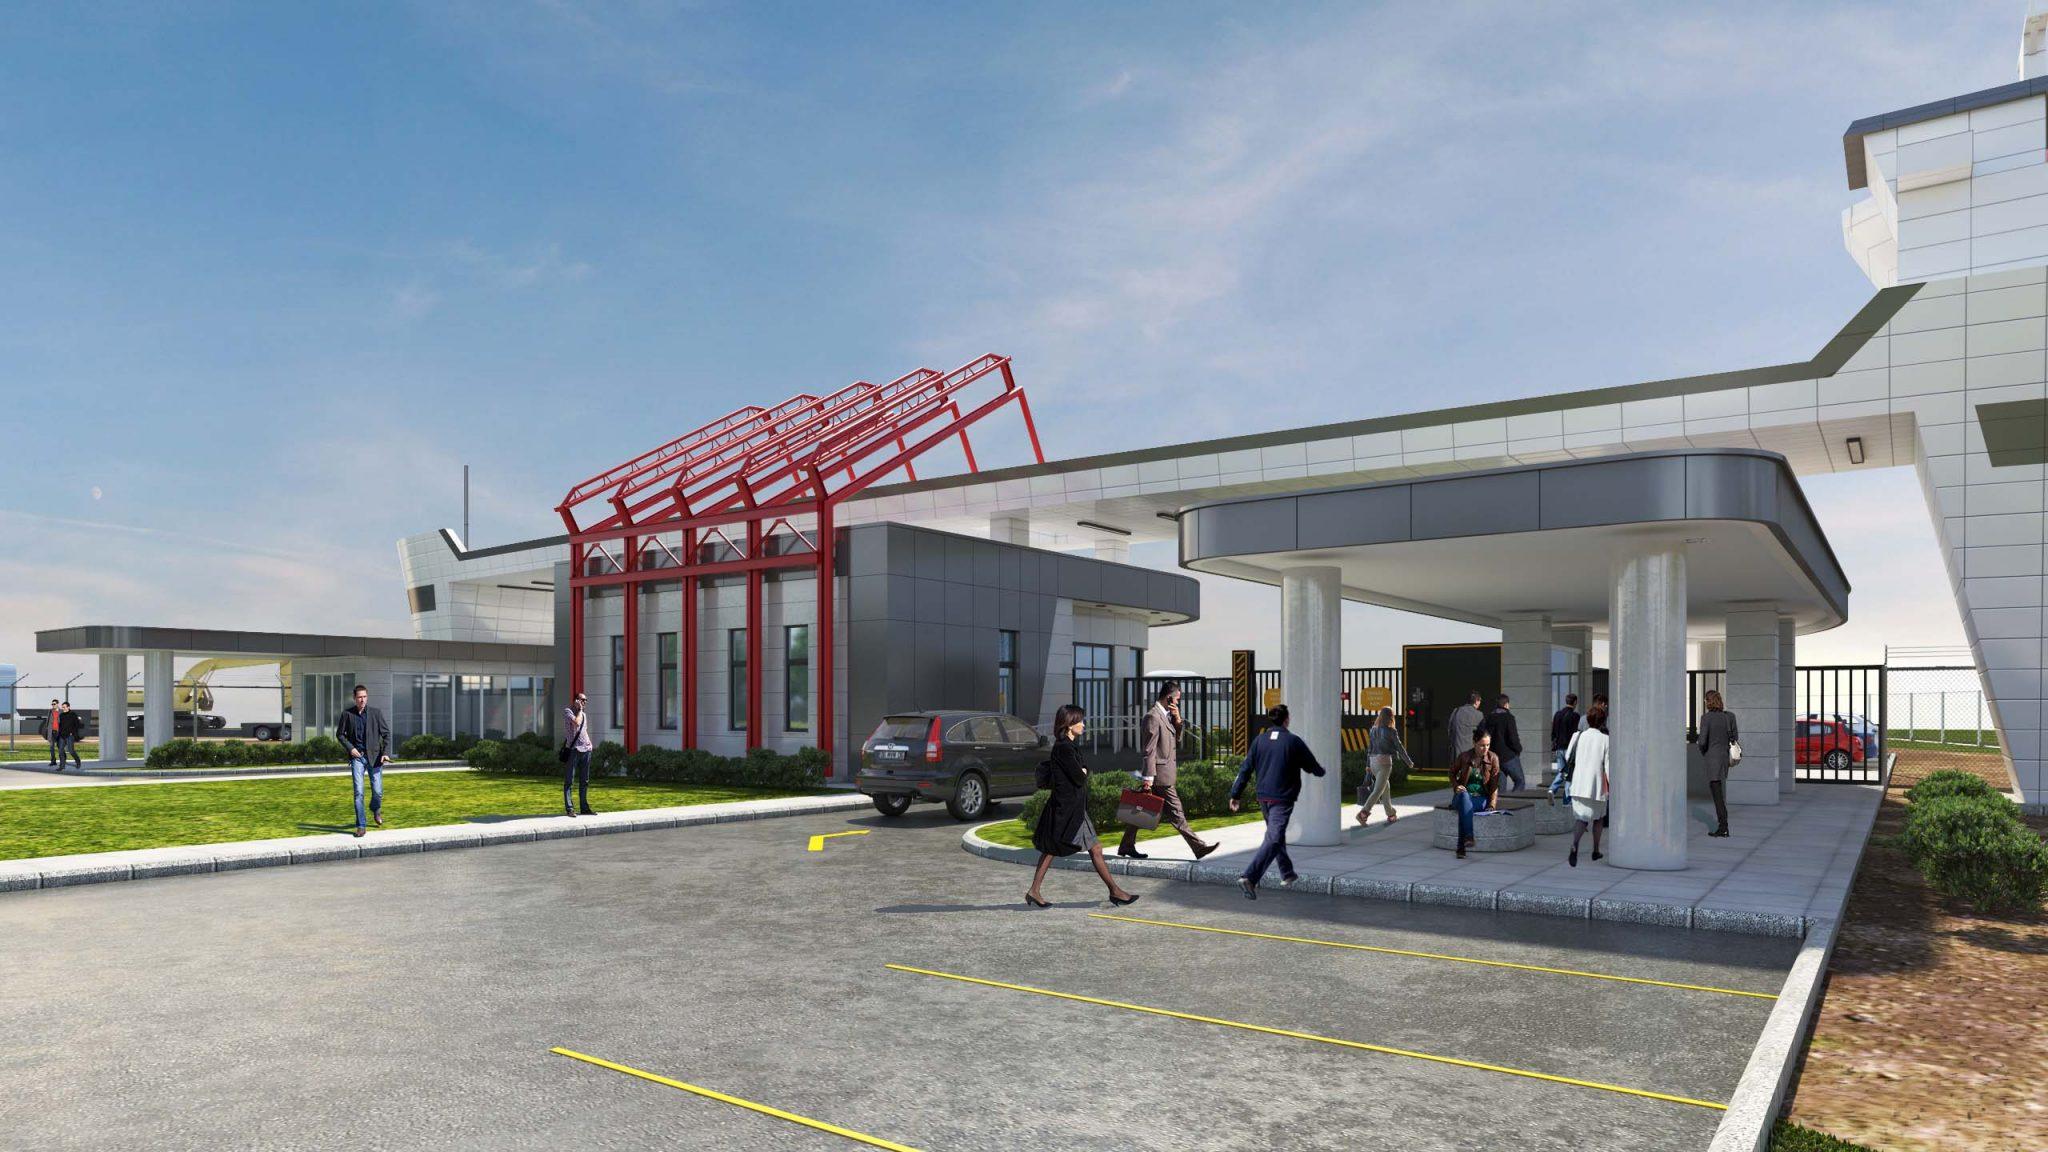 GRC-FİBERTON OVO CONSTRUCTION - BOTAŞ NİZAMİYE KAPISI GRC PREKAST CEPHE KAPLAMA-3